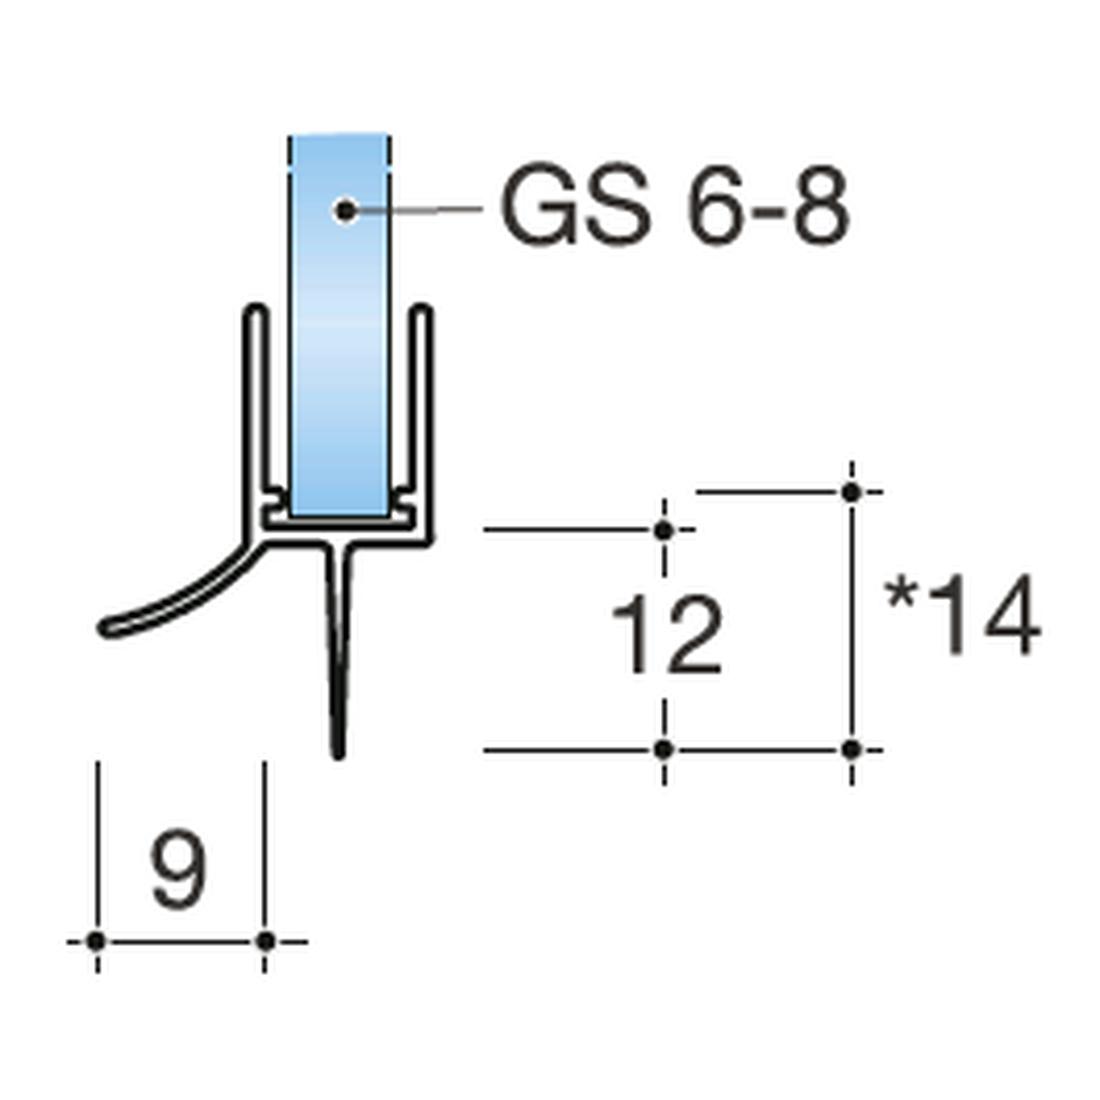 GLASTÜRDICHTUNG 90° GLAS - WAND, GLASSTÄKE 6-8MM